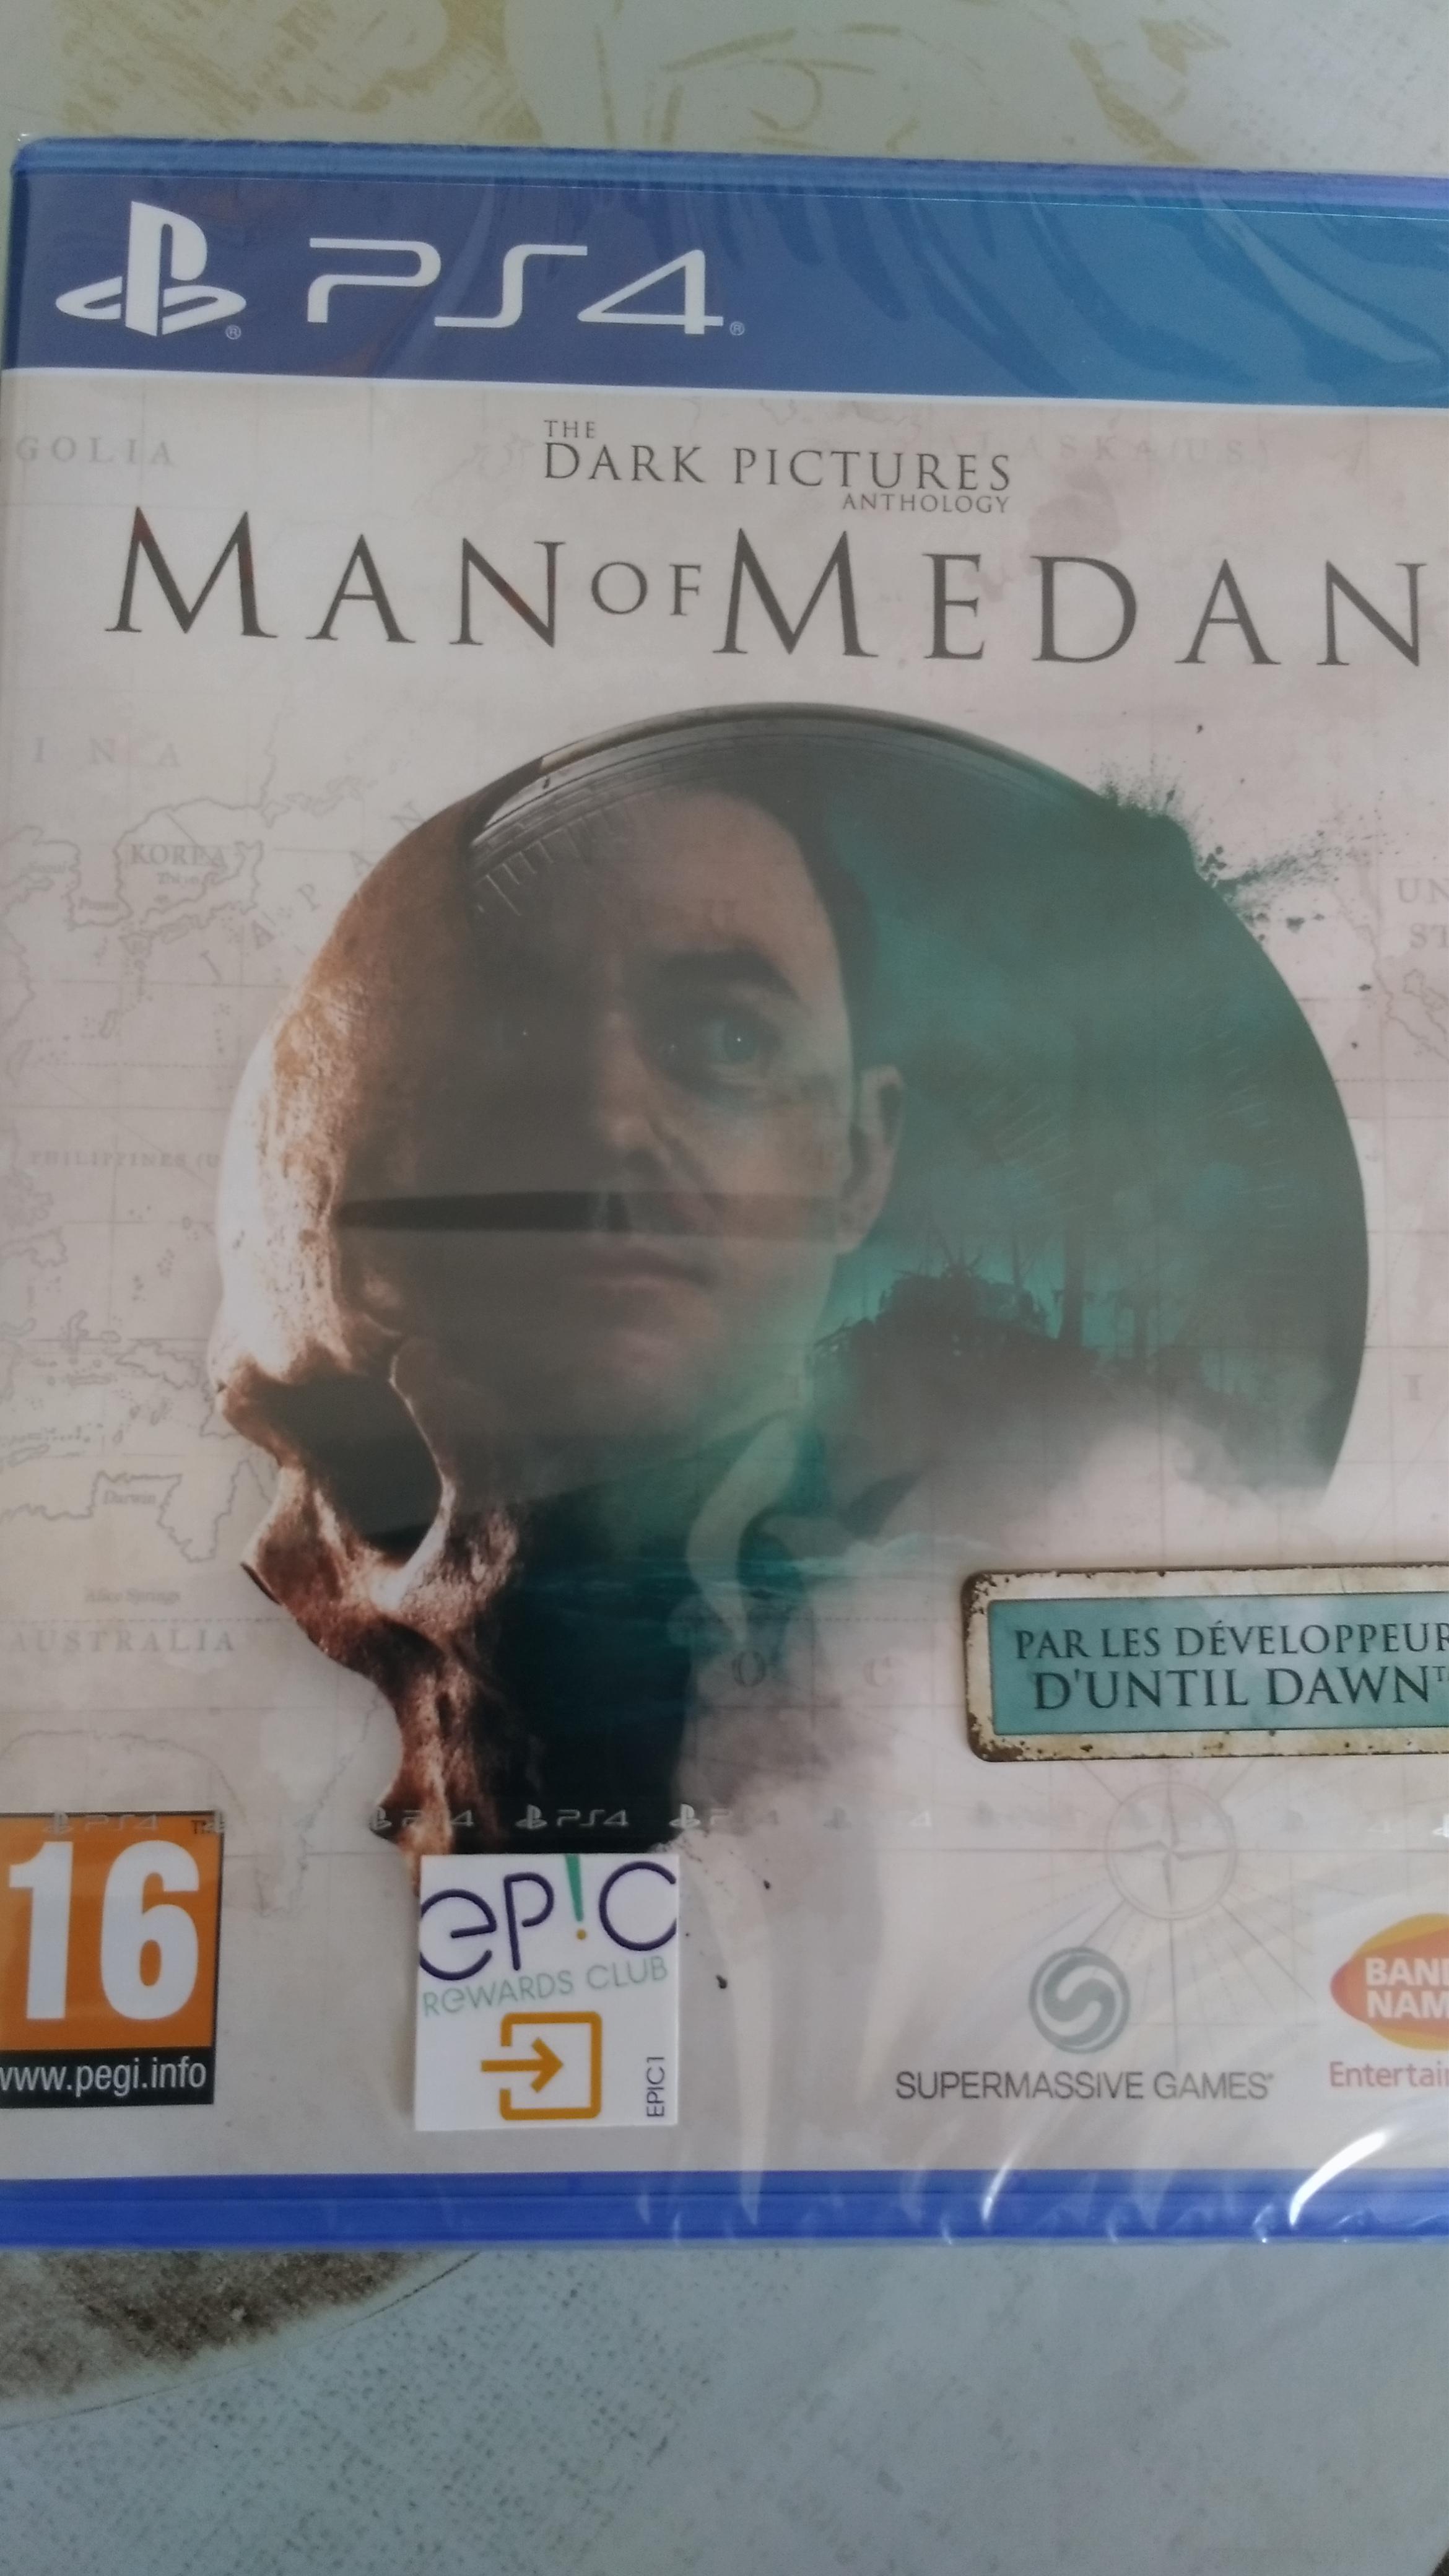 Jeu The Dark Pictures Anthology : Man Of Medan sur PS4 - Saint-Genis-Laval (69)